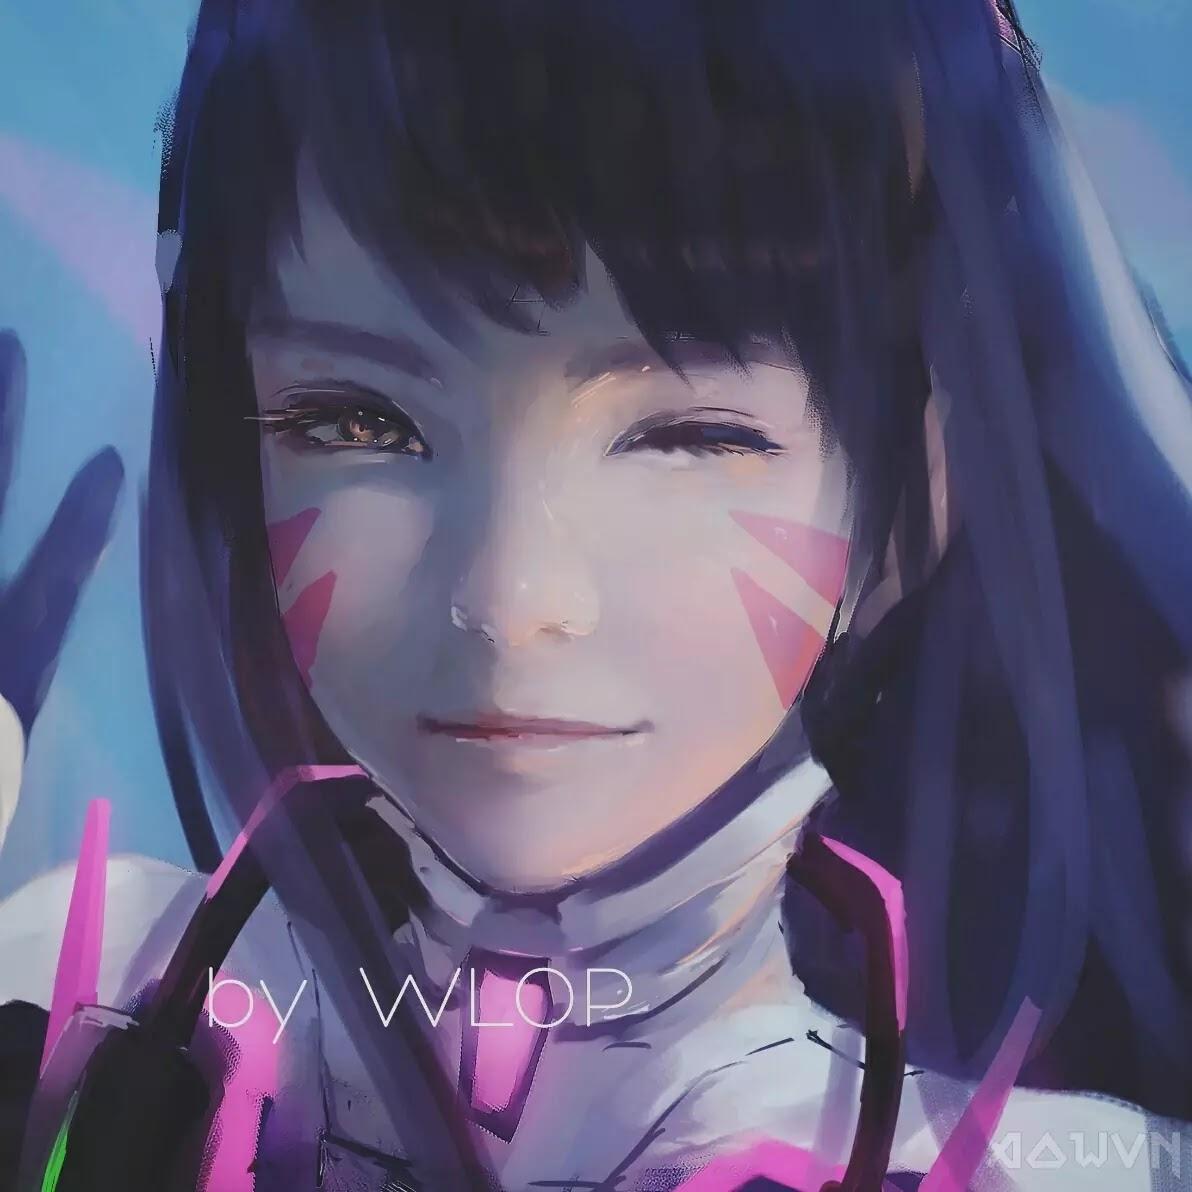 47 AowVN.org m - [ Hình Nền ] Anime Cực Đẹp by Wlop | Wallpaper Premium / Update